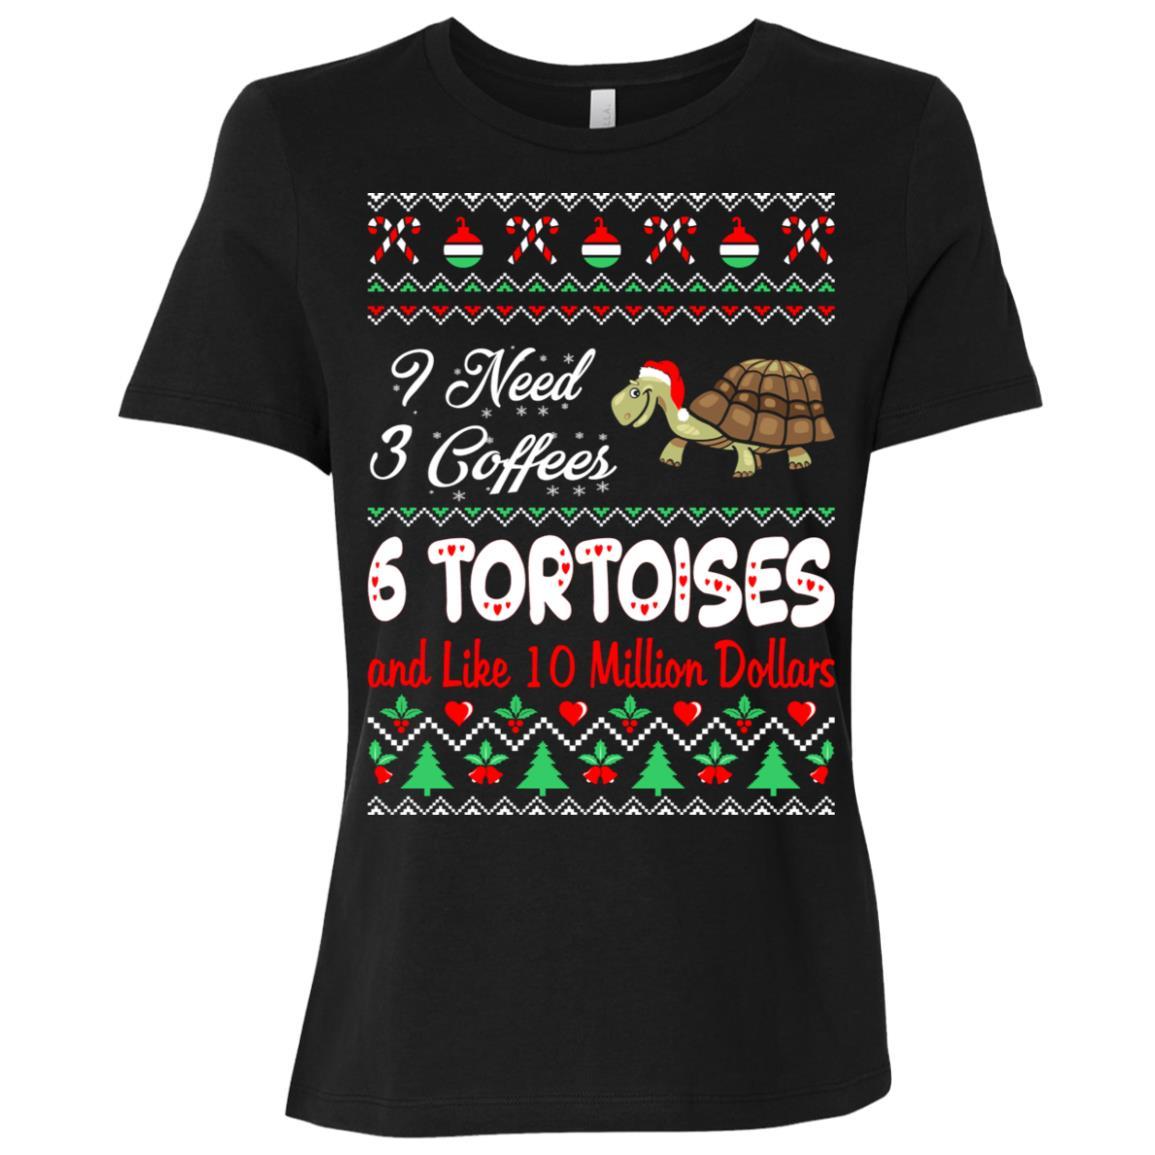 Need 3 Coffees 6 Tortoises Christmas Ugly Sweater Women Short Sleeve T-Shirt